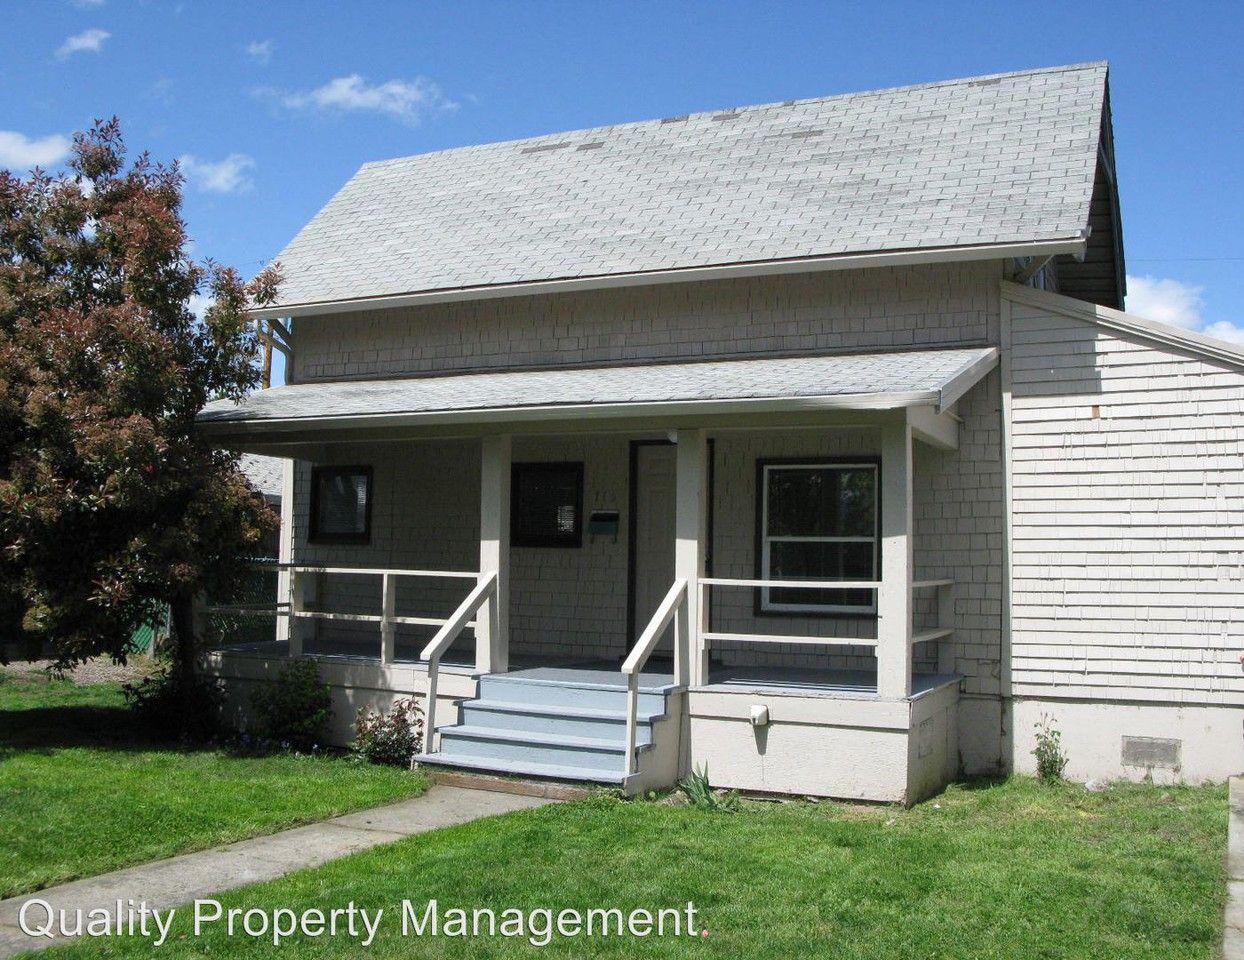 710 Palm St, Medford, OR 97501 3 Bedroom House for Rent ...